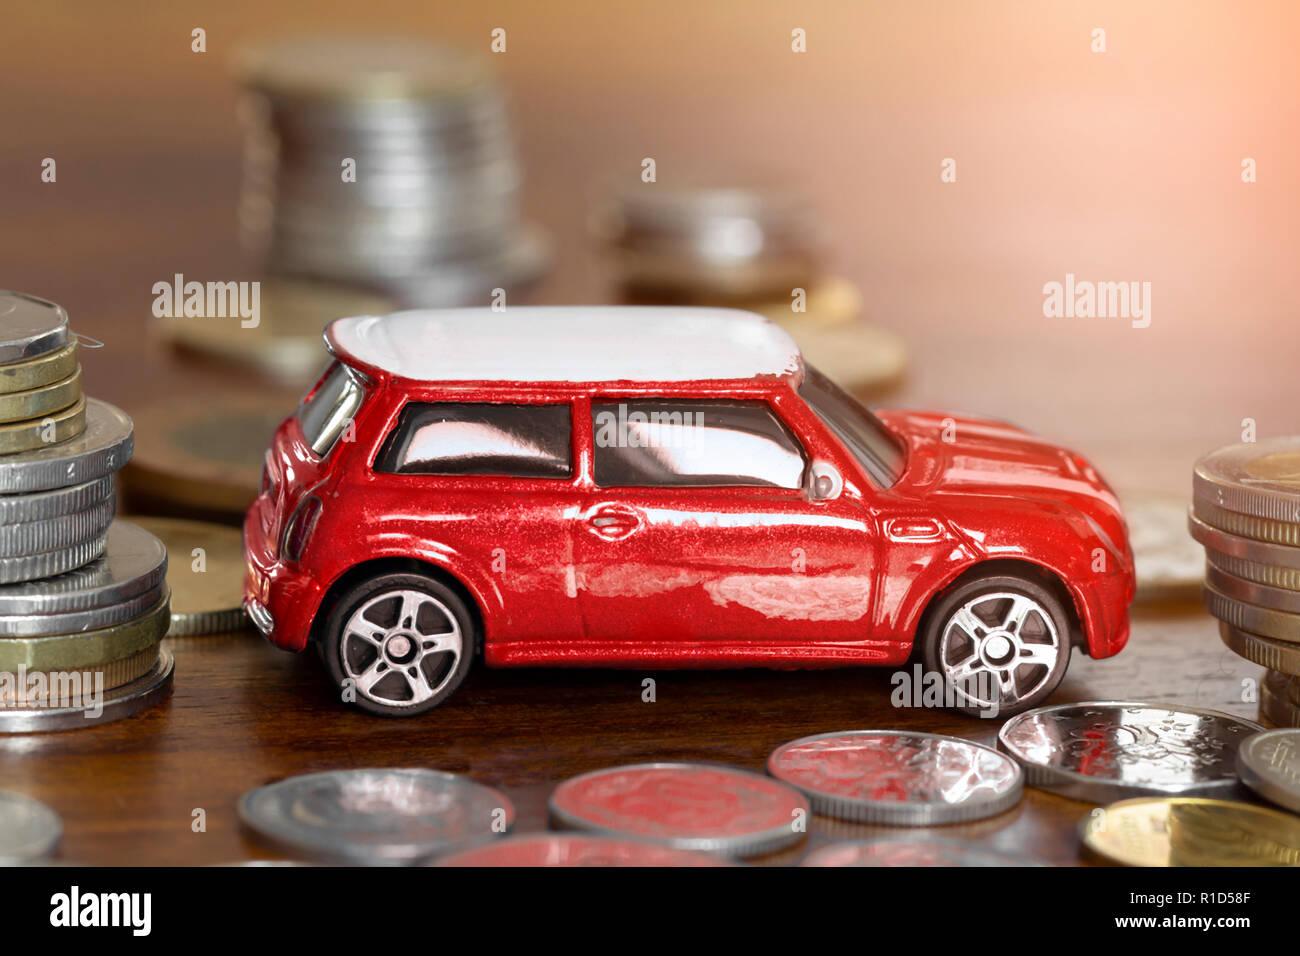 Auto Finanzierung oder Leasing Konzept Stockbild